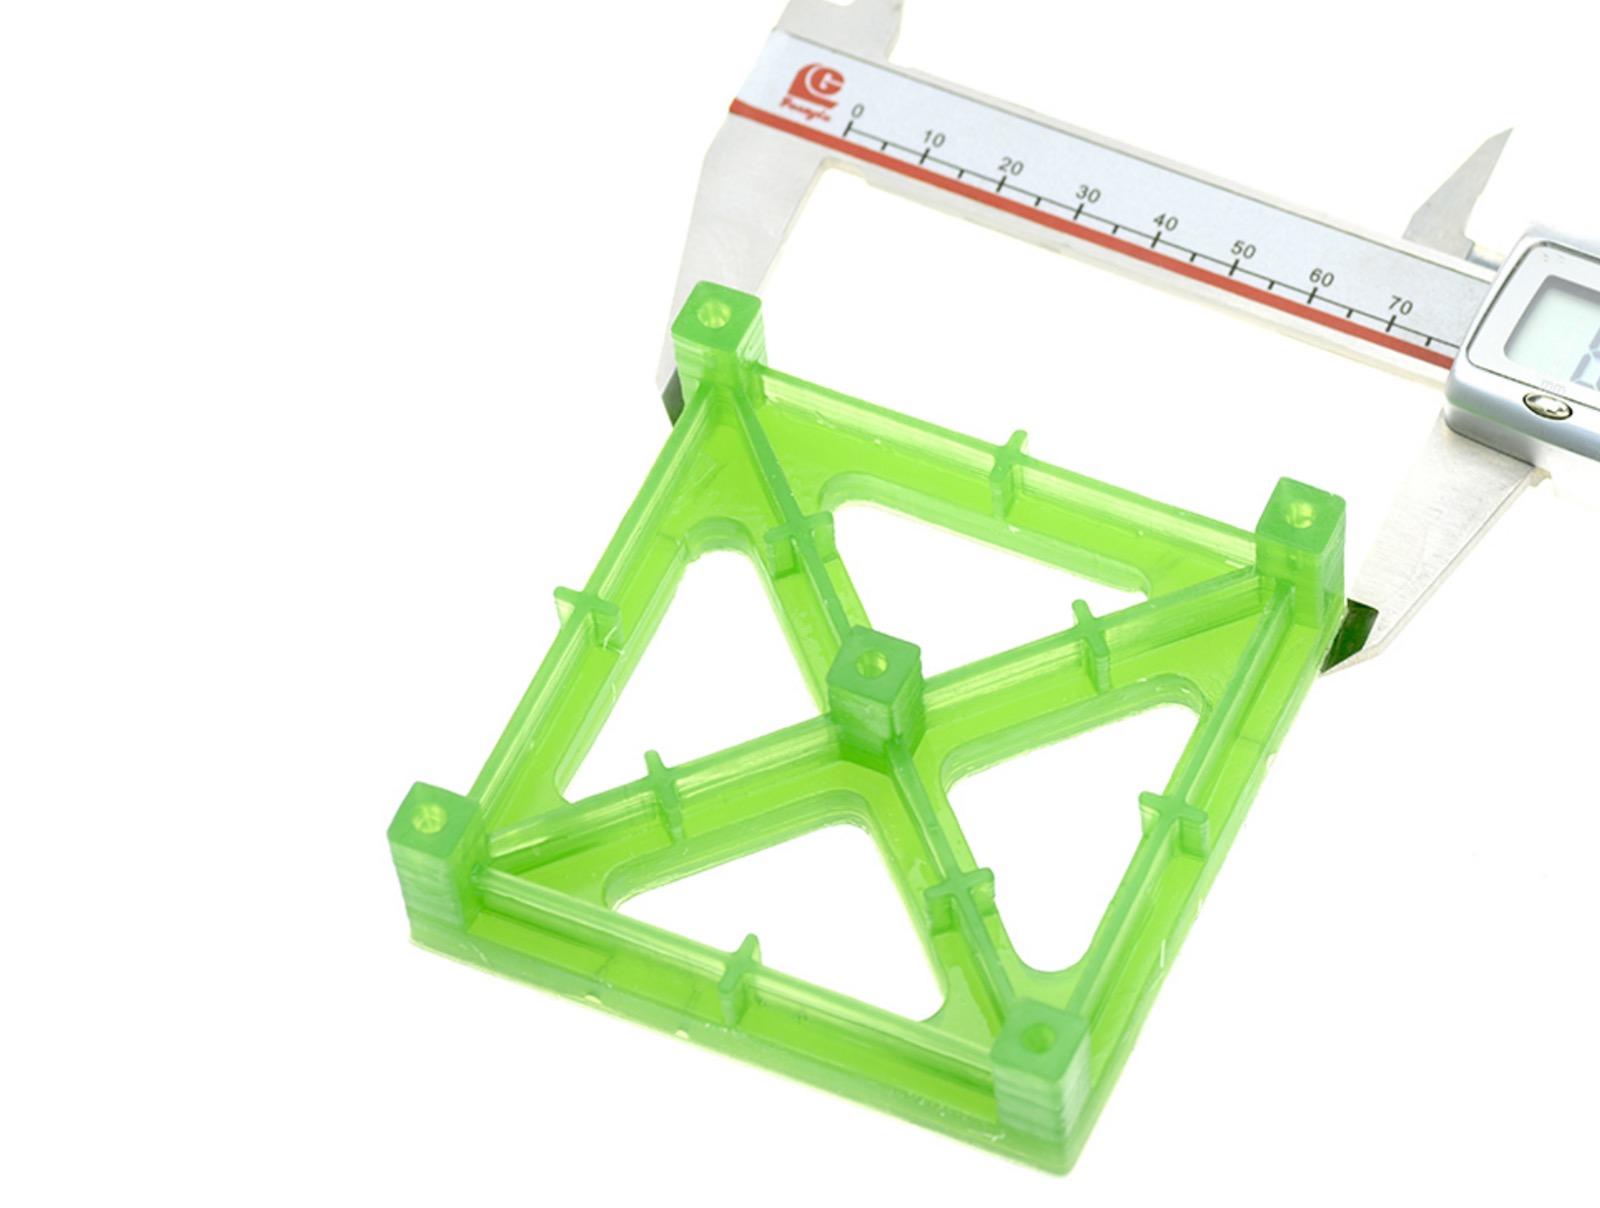 Uniz Slash - Superfast SLA 3D Printer Is Huge Kickstarter